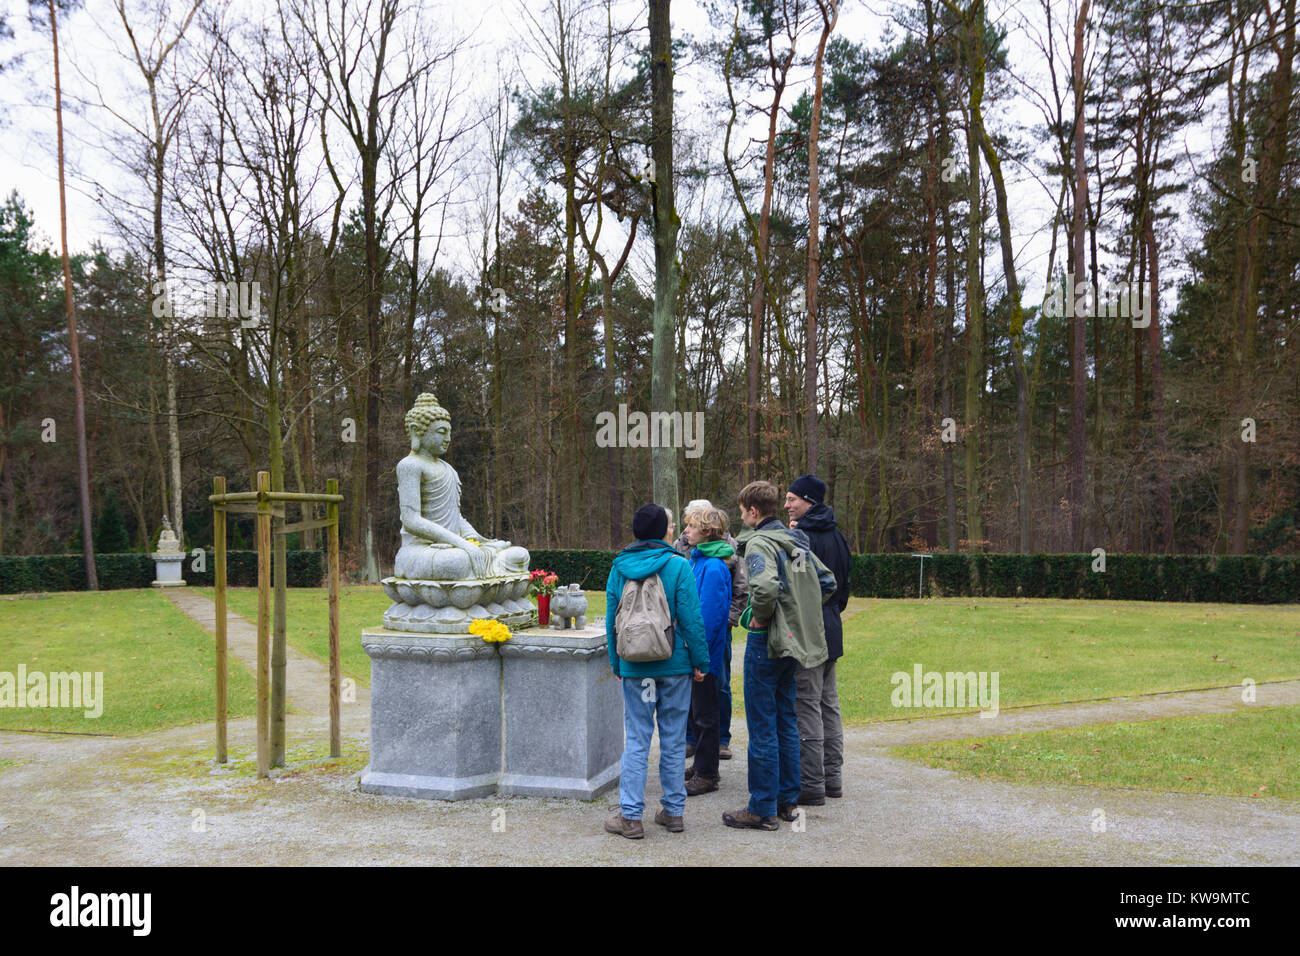 Buddhist cemetery graveyard - Stock Image